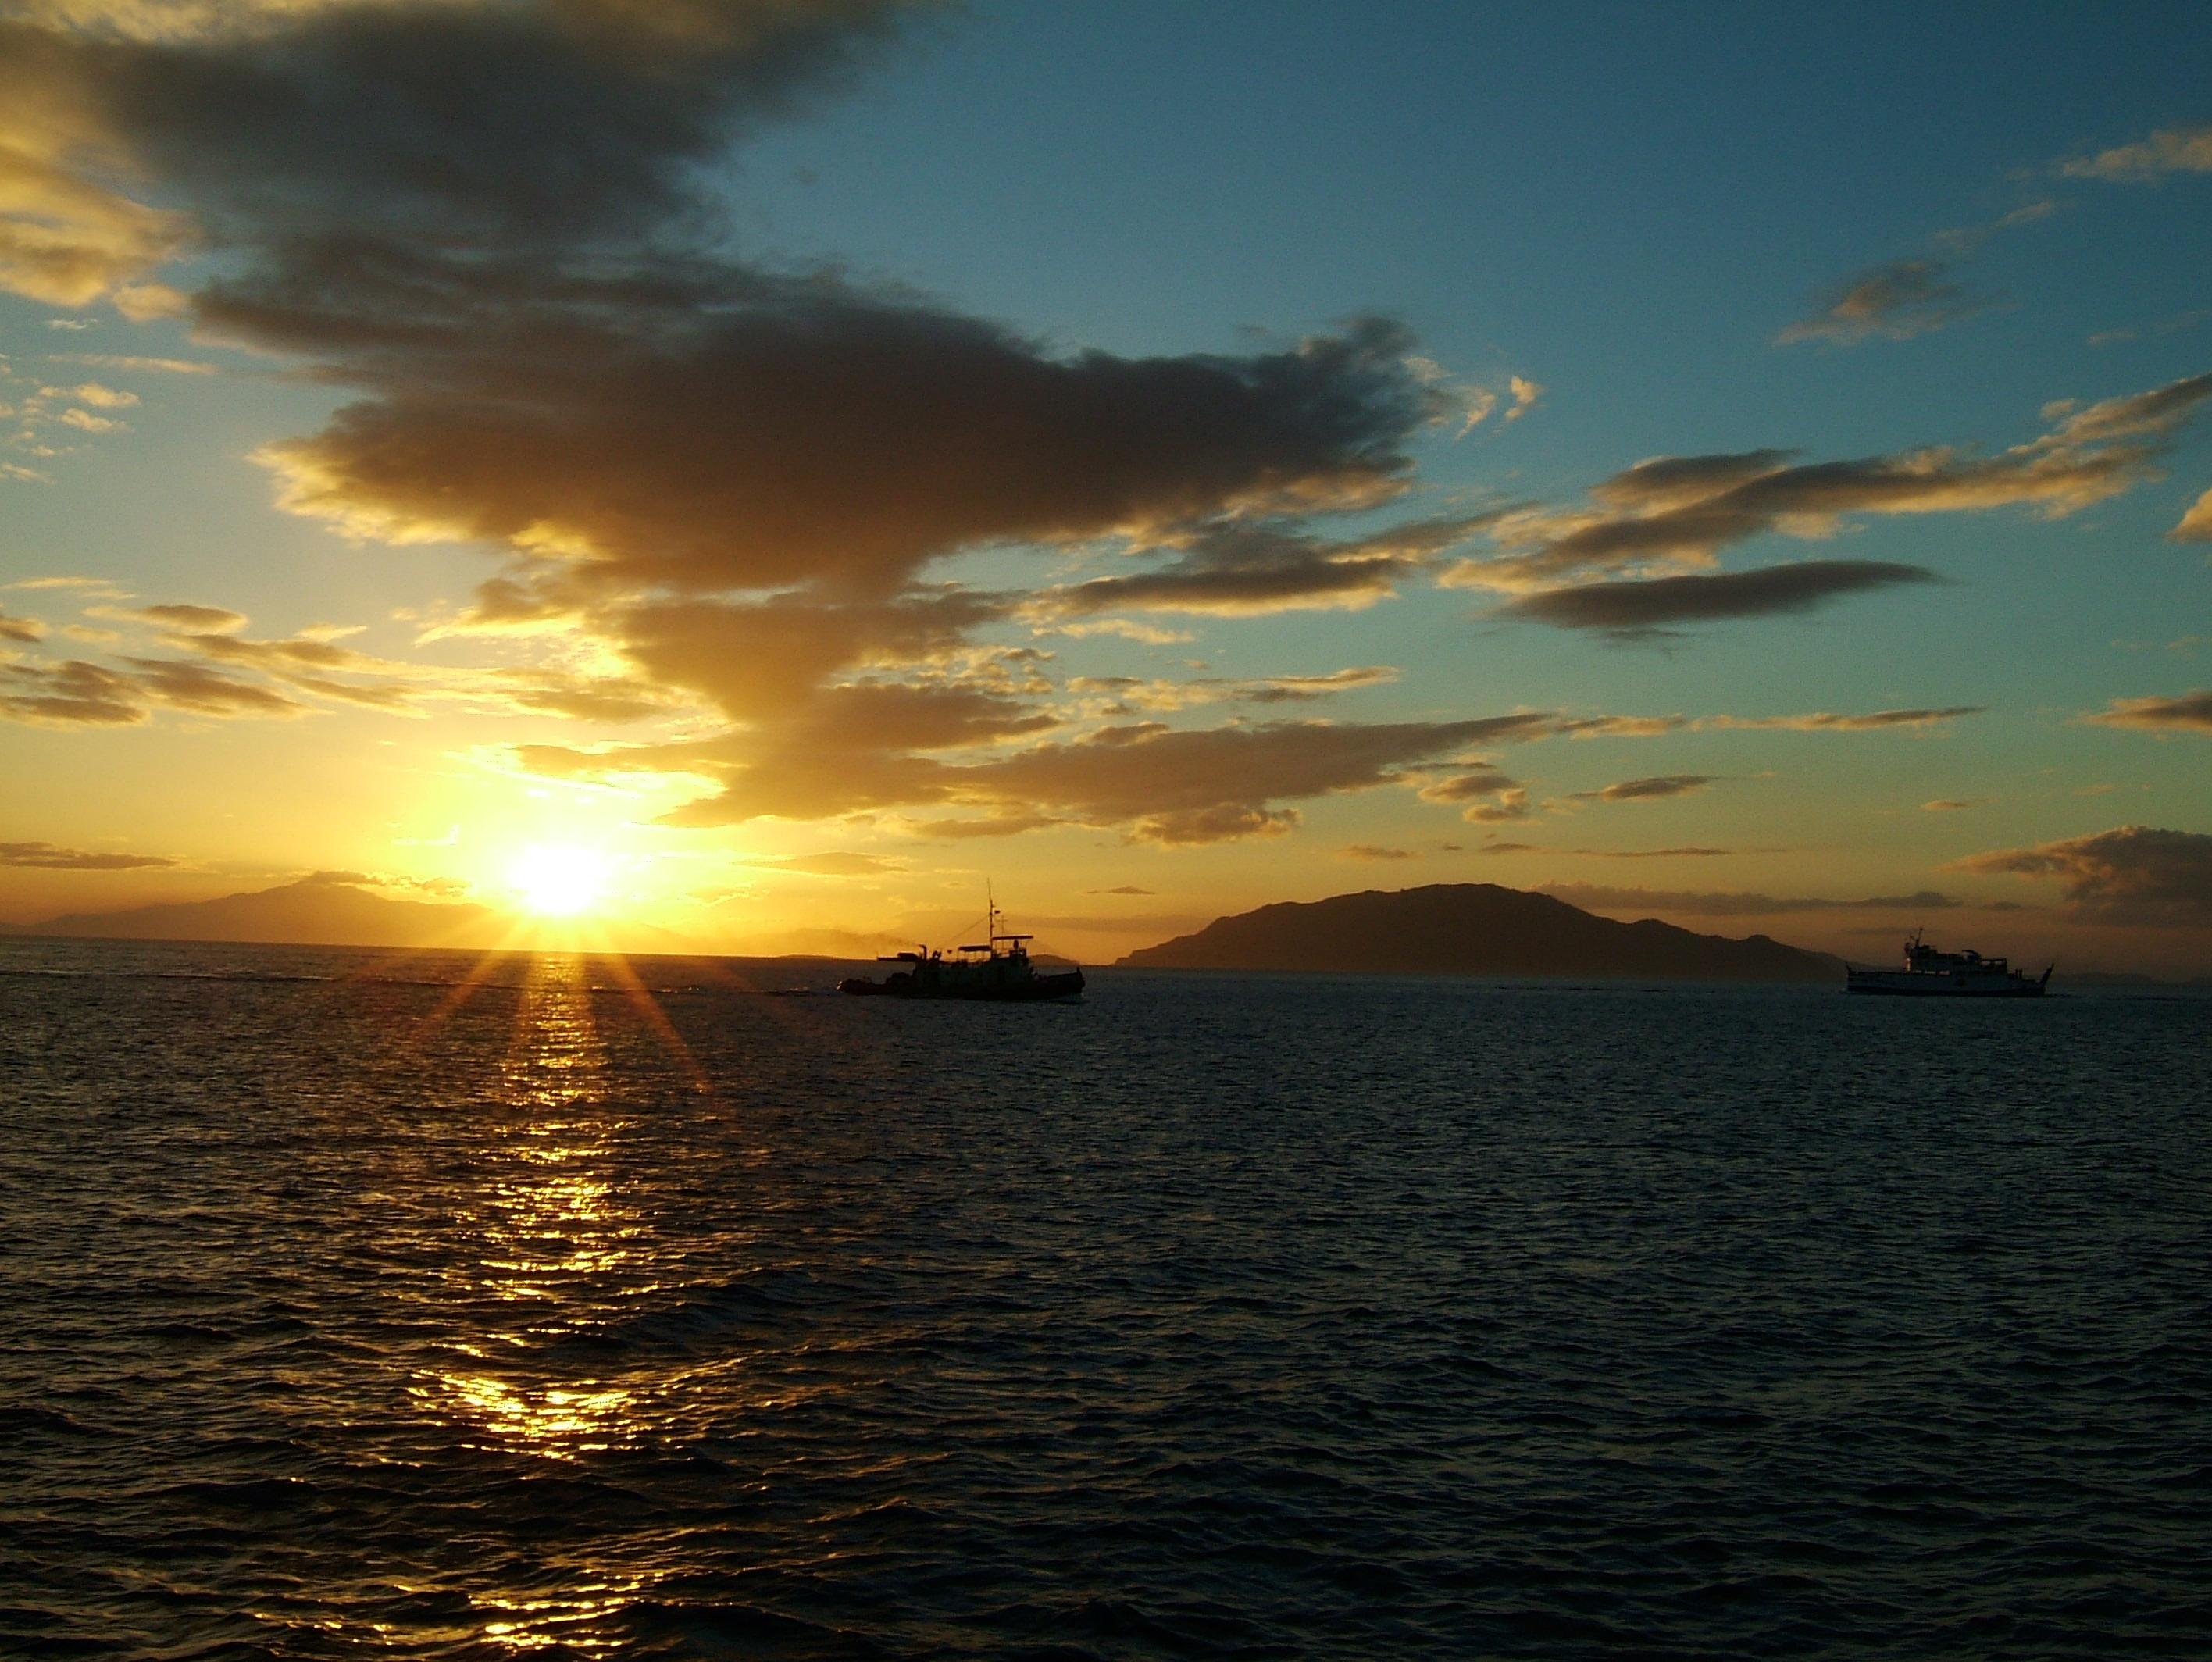 The banca passage Batangas to Tabinay via Verde Island passage 01